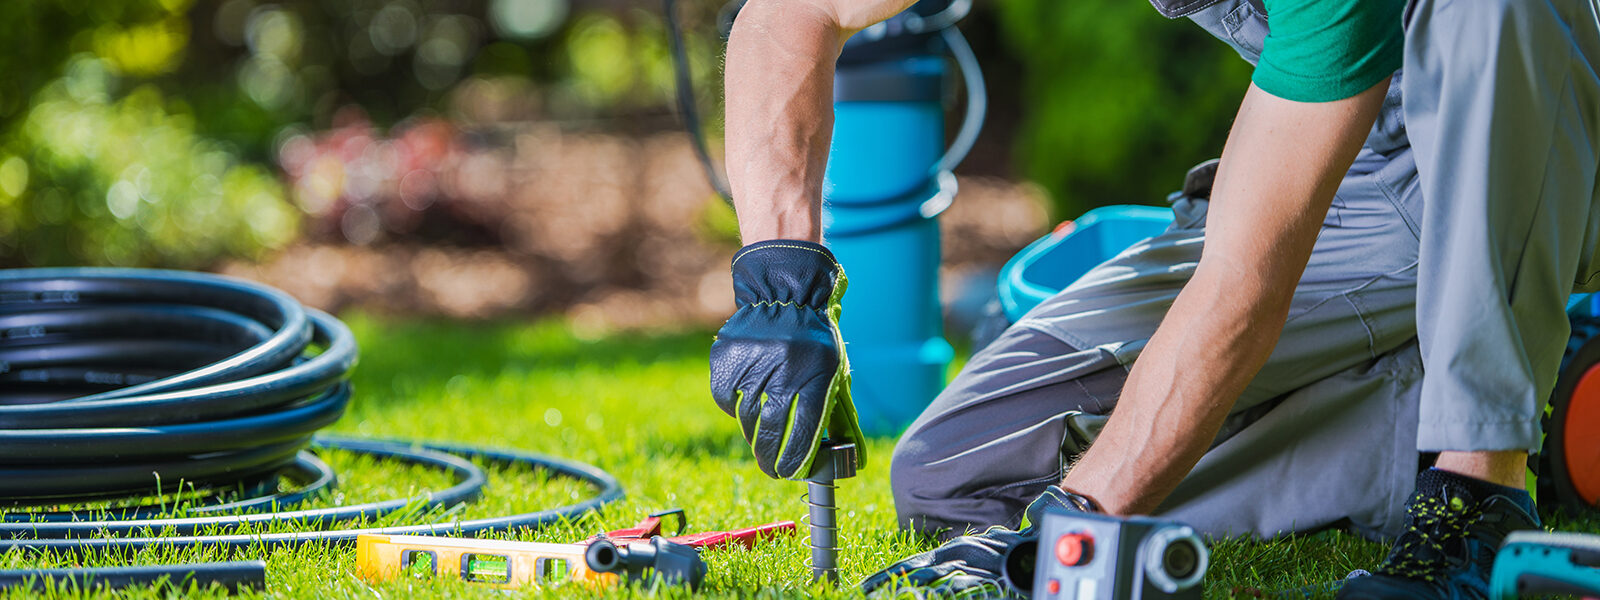 Garden Automatic Watering Systems Installer. Garden System Technician at Work.